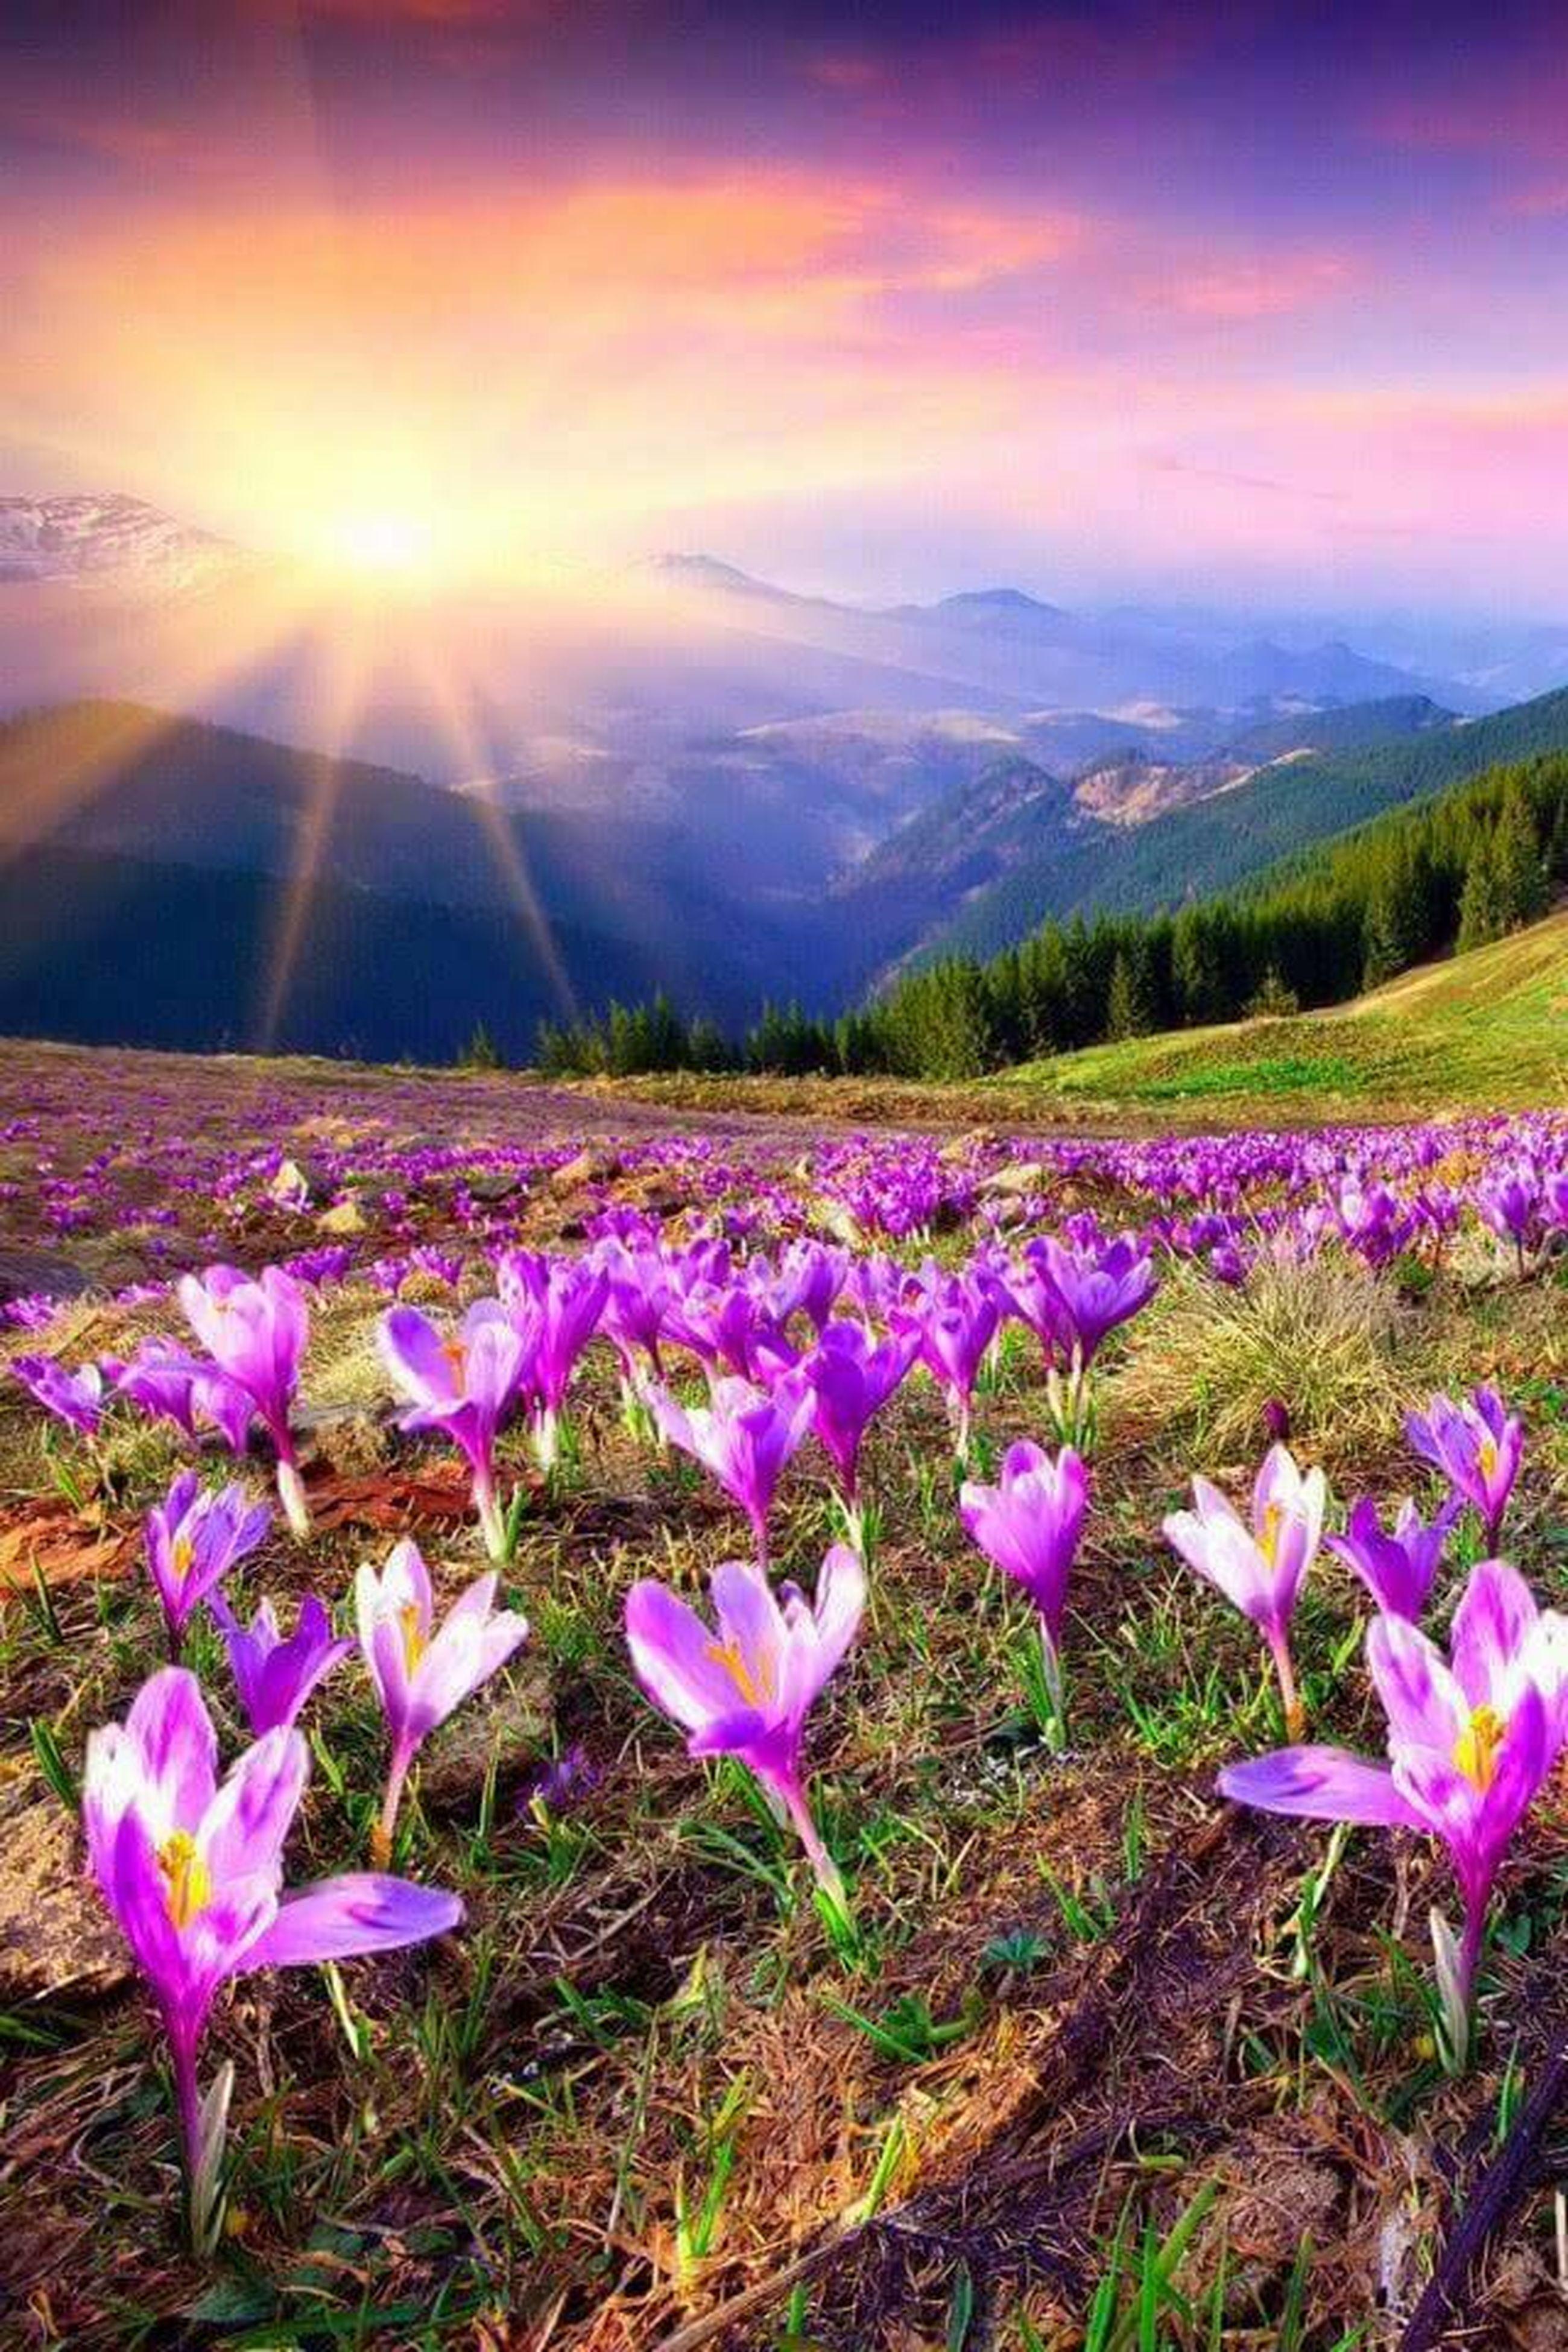 flower, beauty in nature, landscape, field, sky, tranquil scene, nature, tranquility, grass, plant, sunlight, scenics, growth, purple, sunbeam, mountain, cloud - sky, sun, non-urban scene, no people